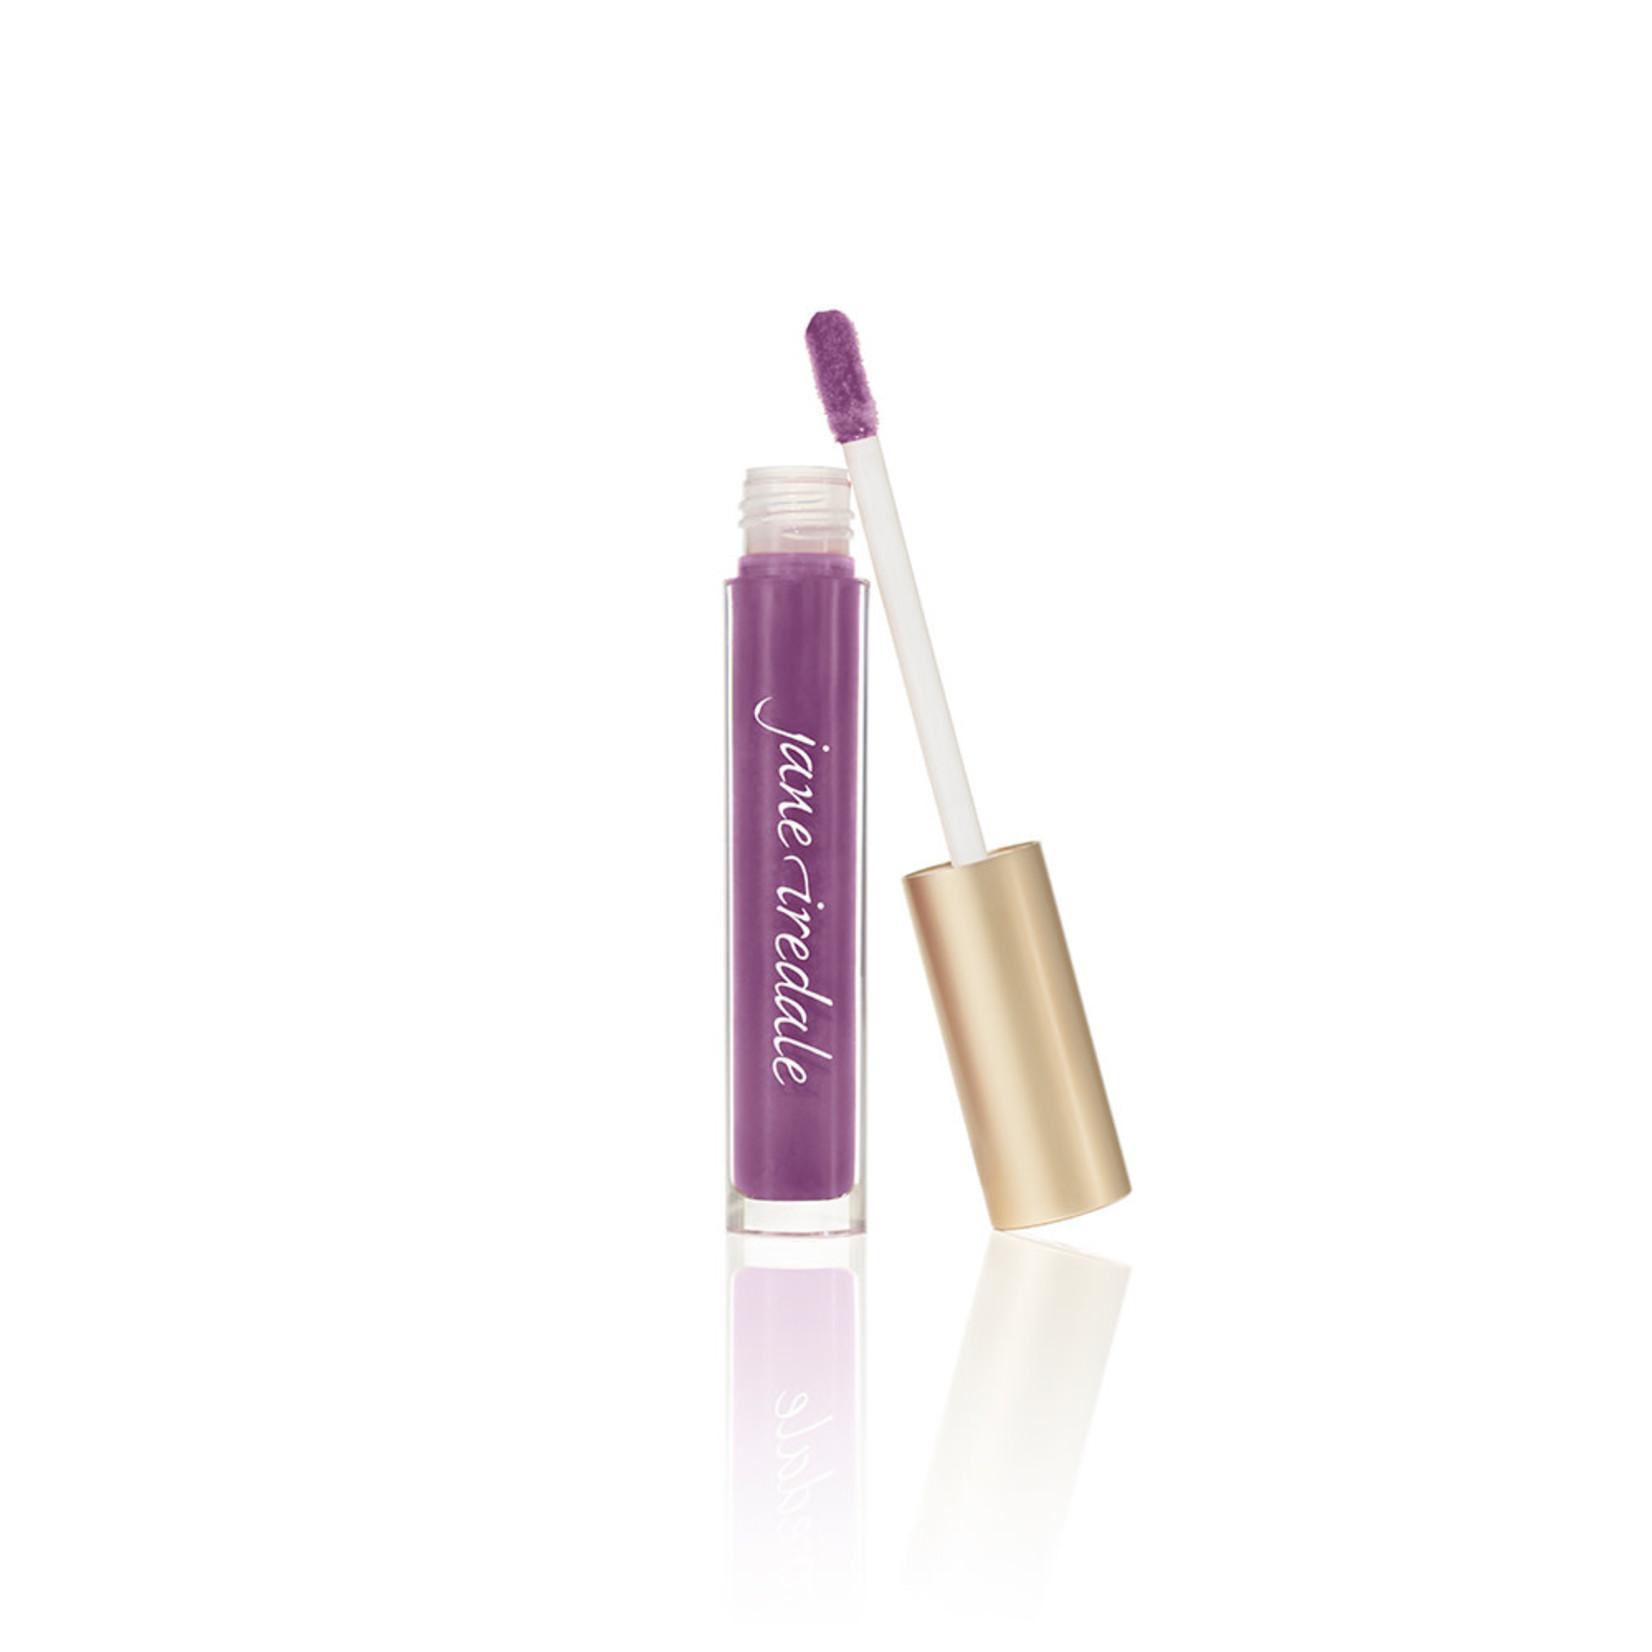 jane iredale Hyaluronic lip gloss - tourmaline